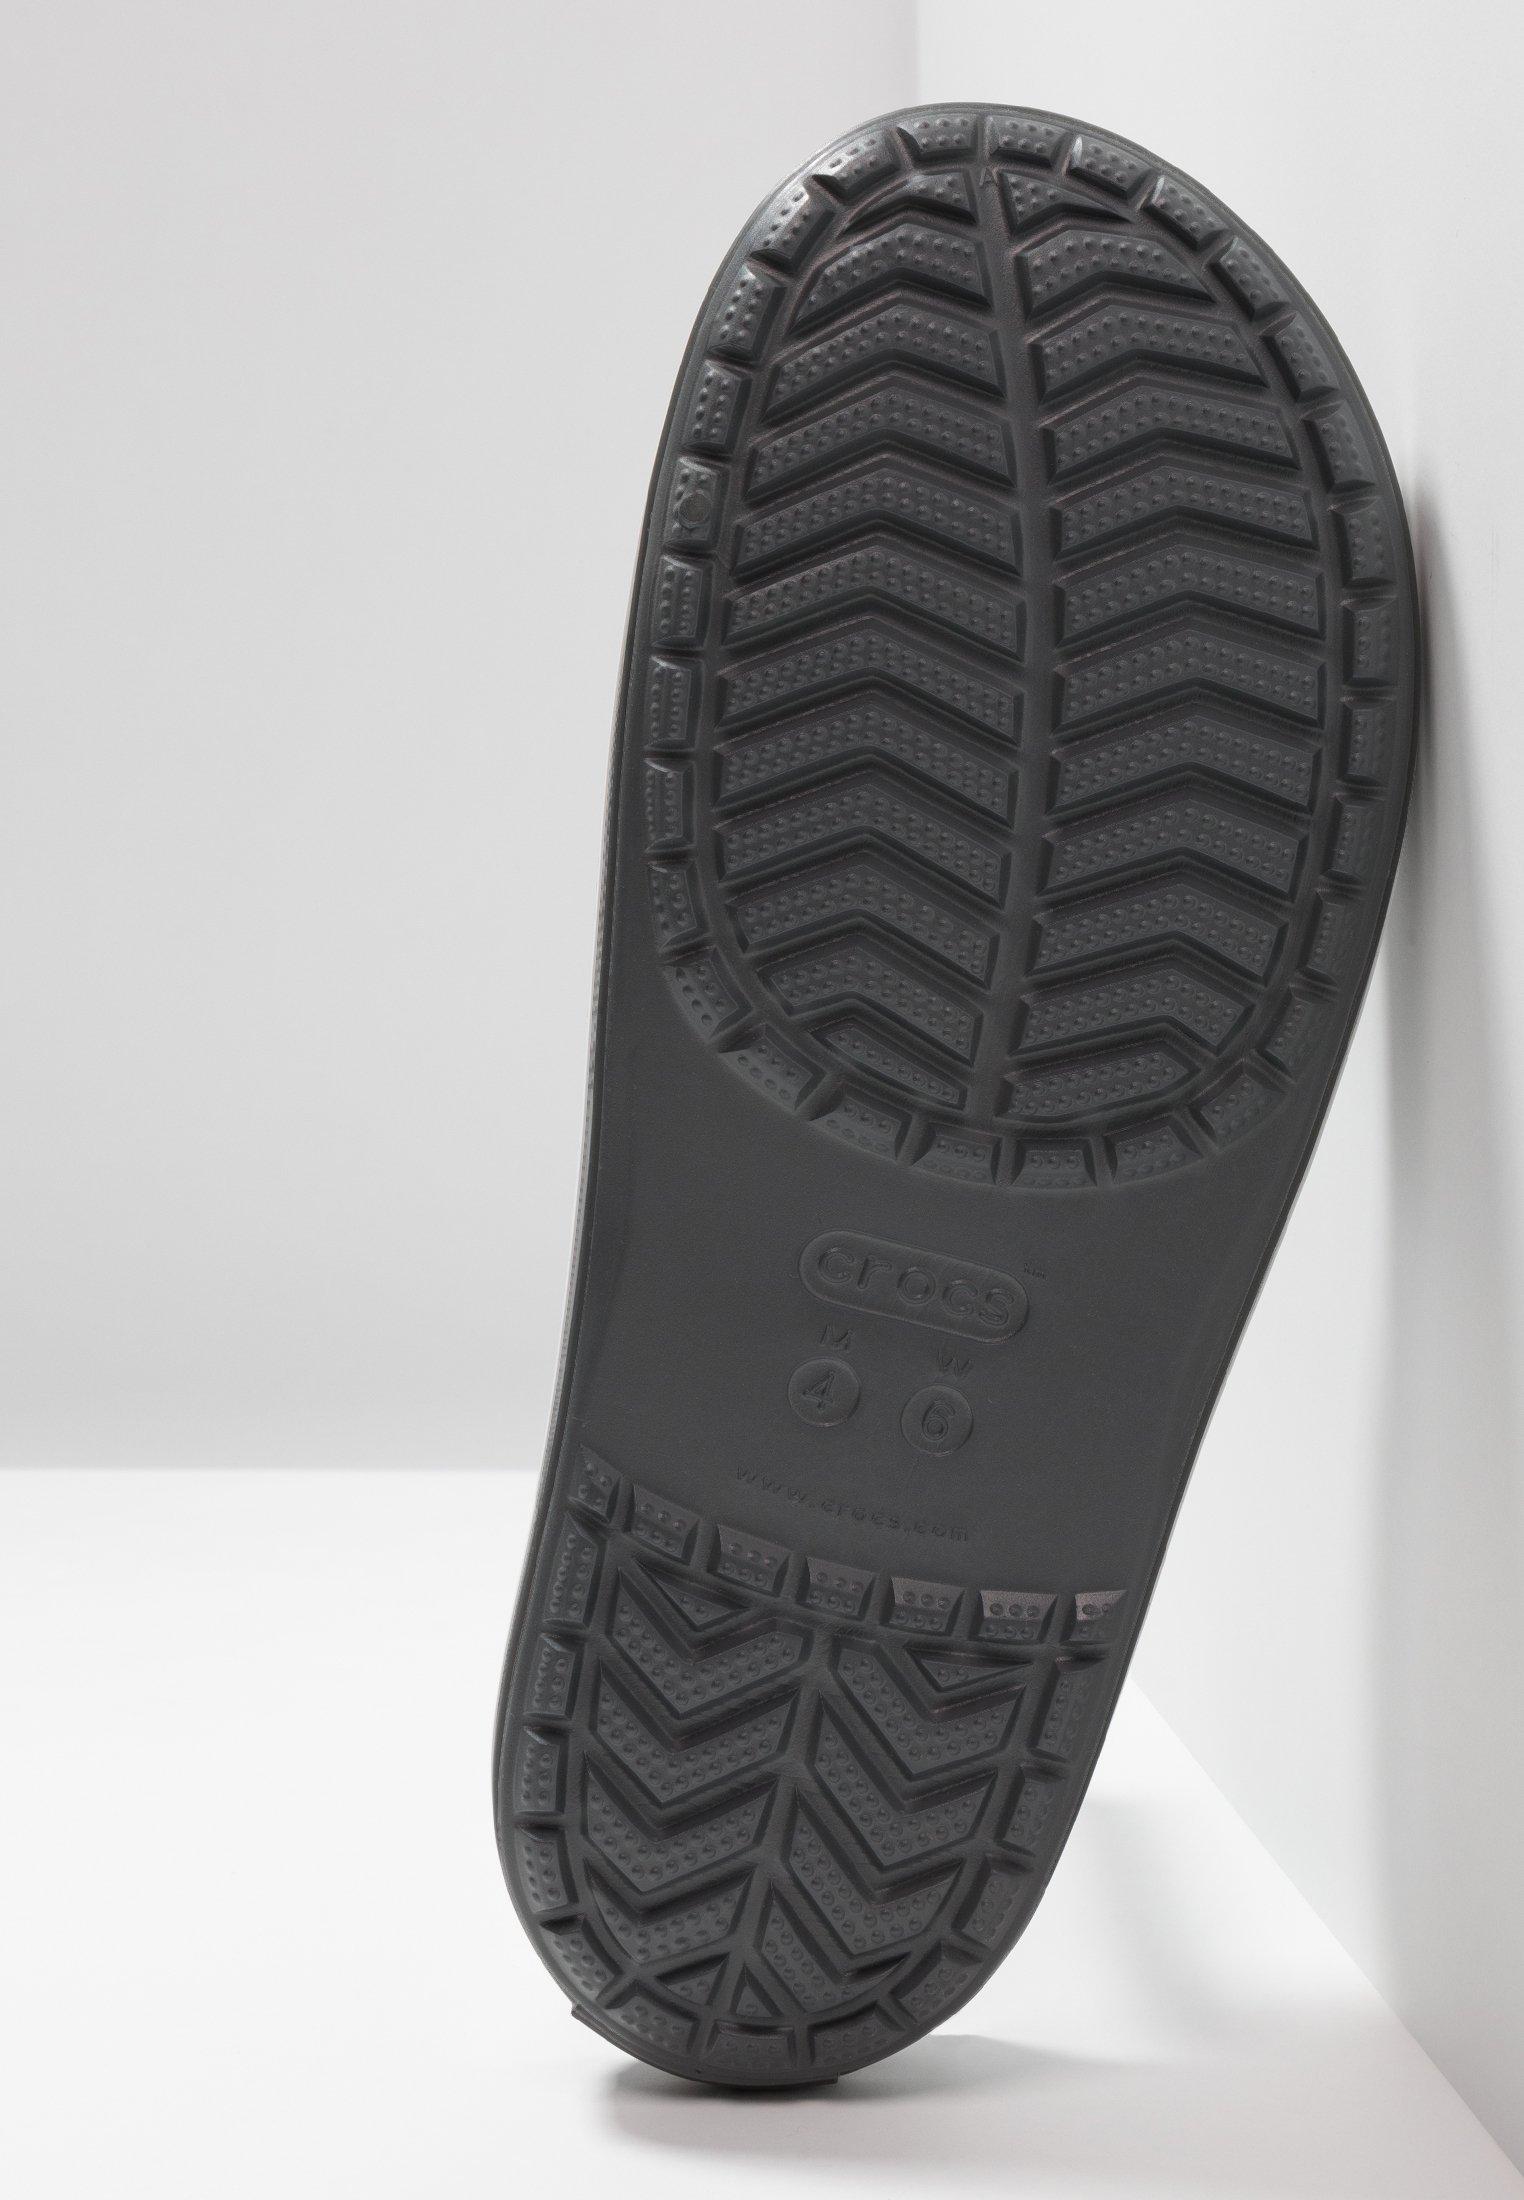 Crocs SLIDE - Sandali da bagno slate grey/white